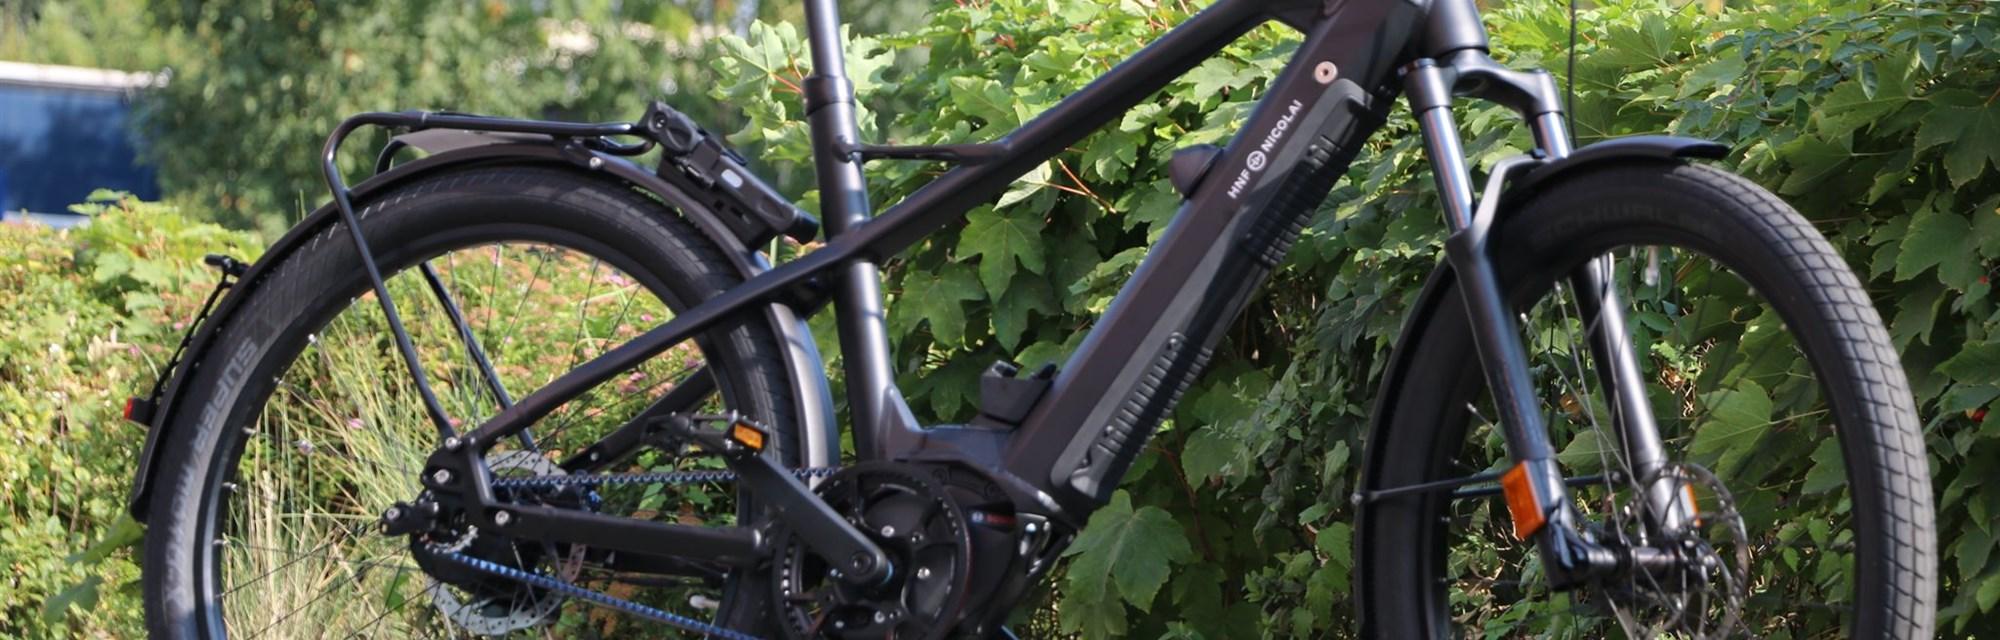 Jetzt NEU bei uns! E-Bikes von HNF - Nicolai!!